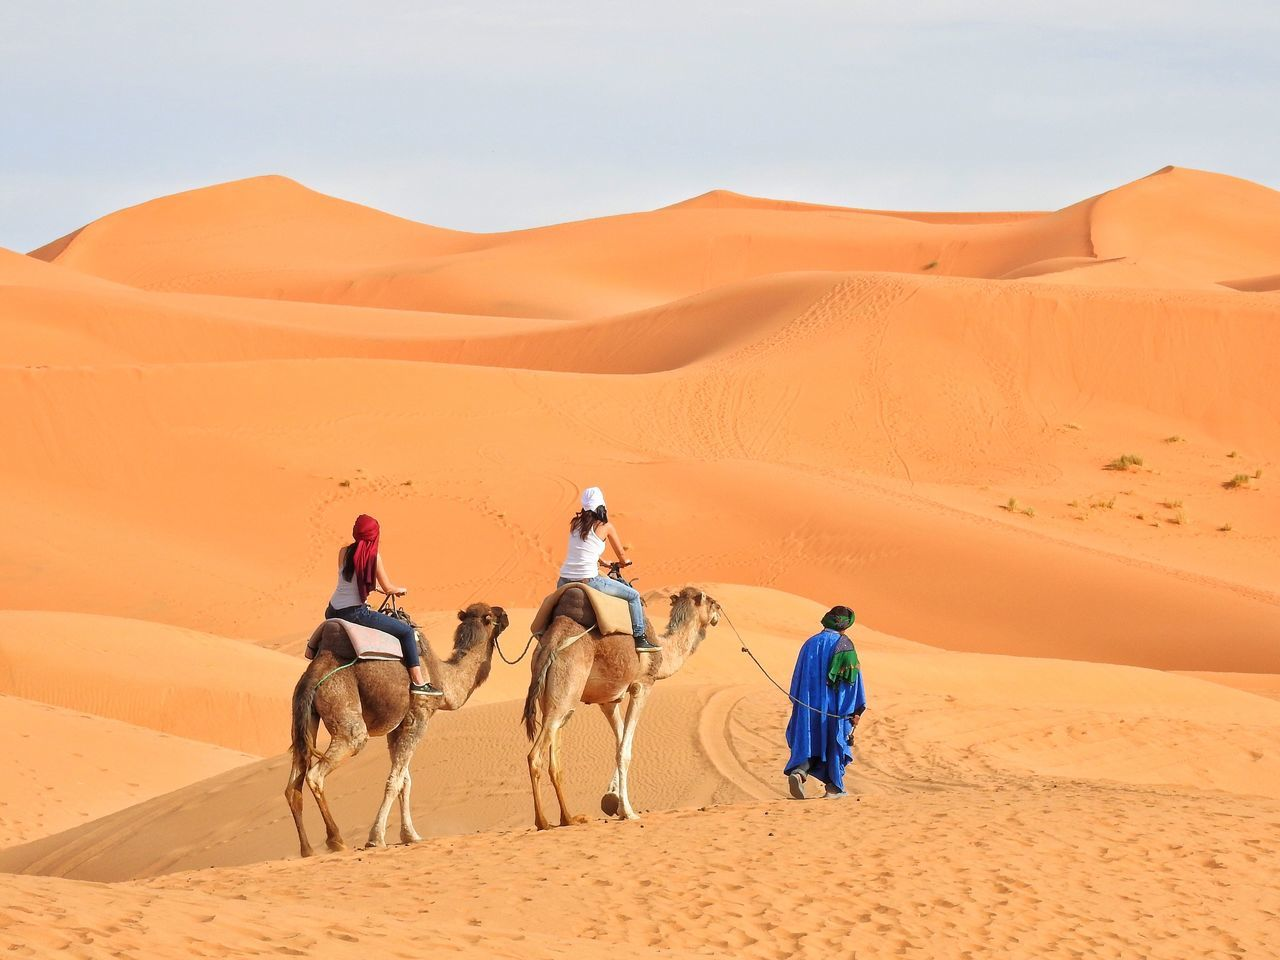 Beautiful stock photos of wüste, desert, sand dune, camel, sand